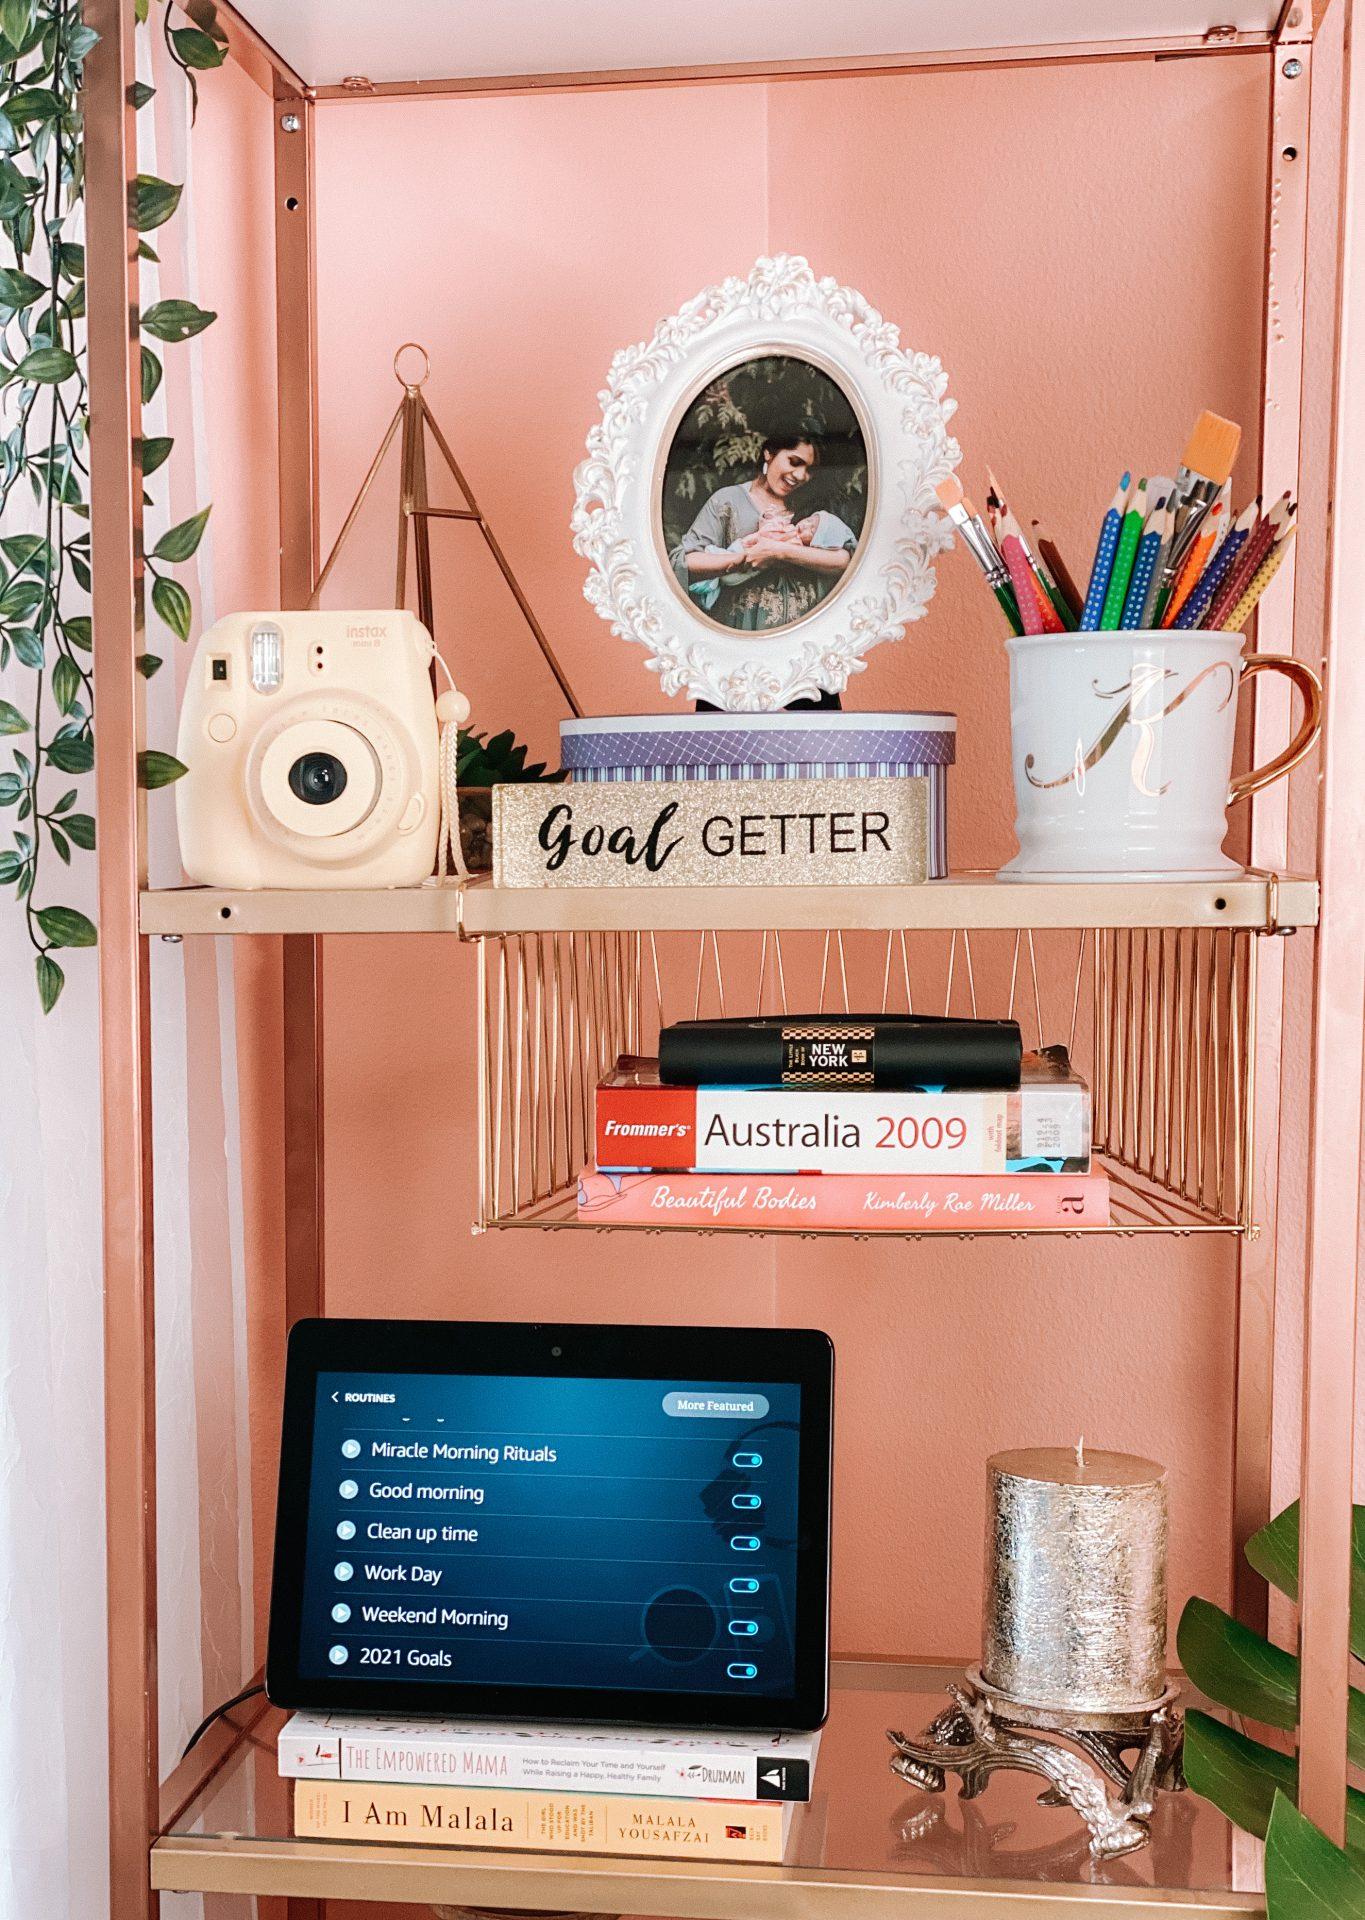 Amazon-Devices-Best-Alexa-Features-Skills-Blueprints-Smart-home-echo-show-office-decor-bookshelf